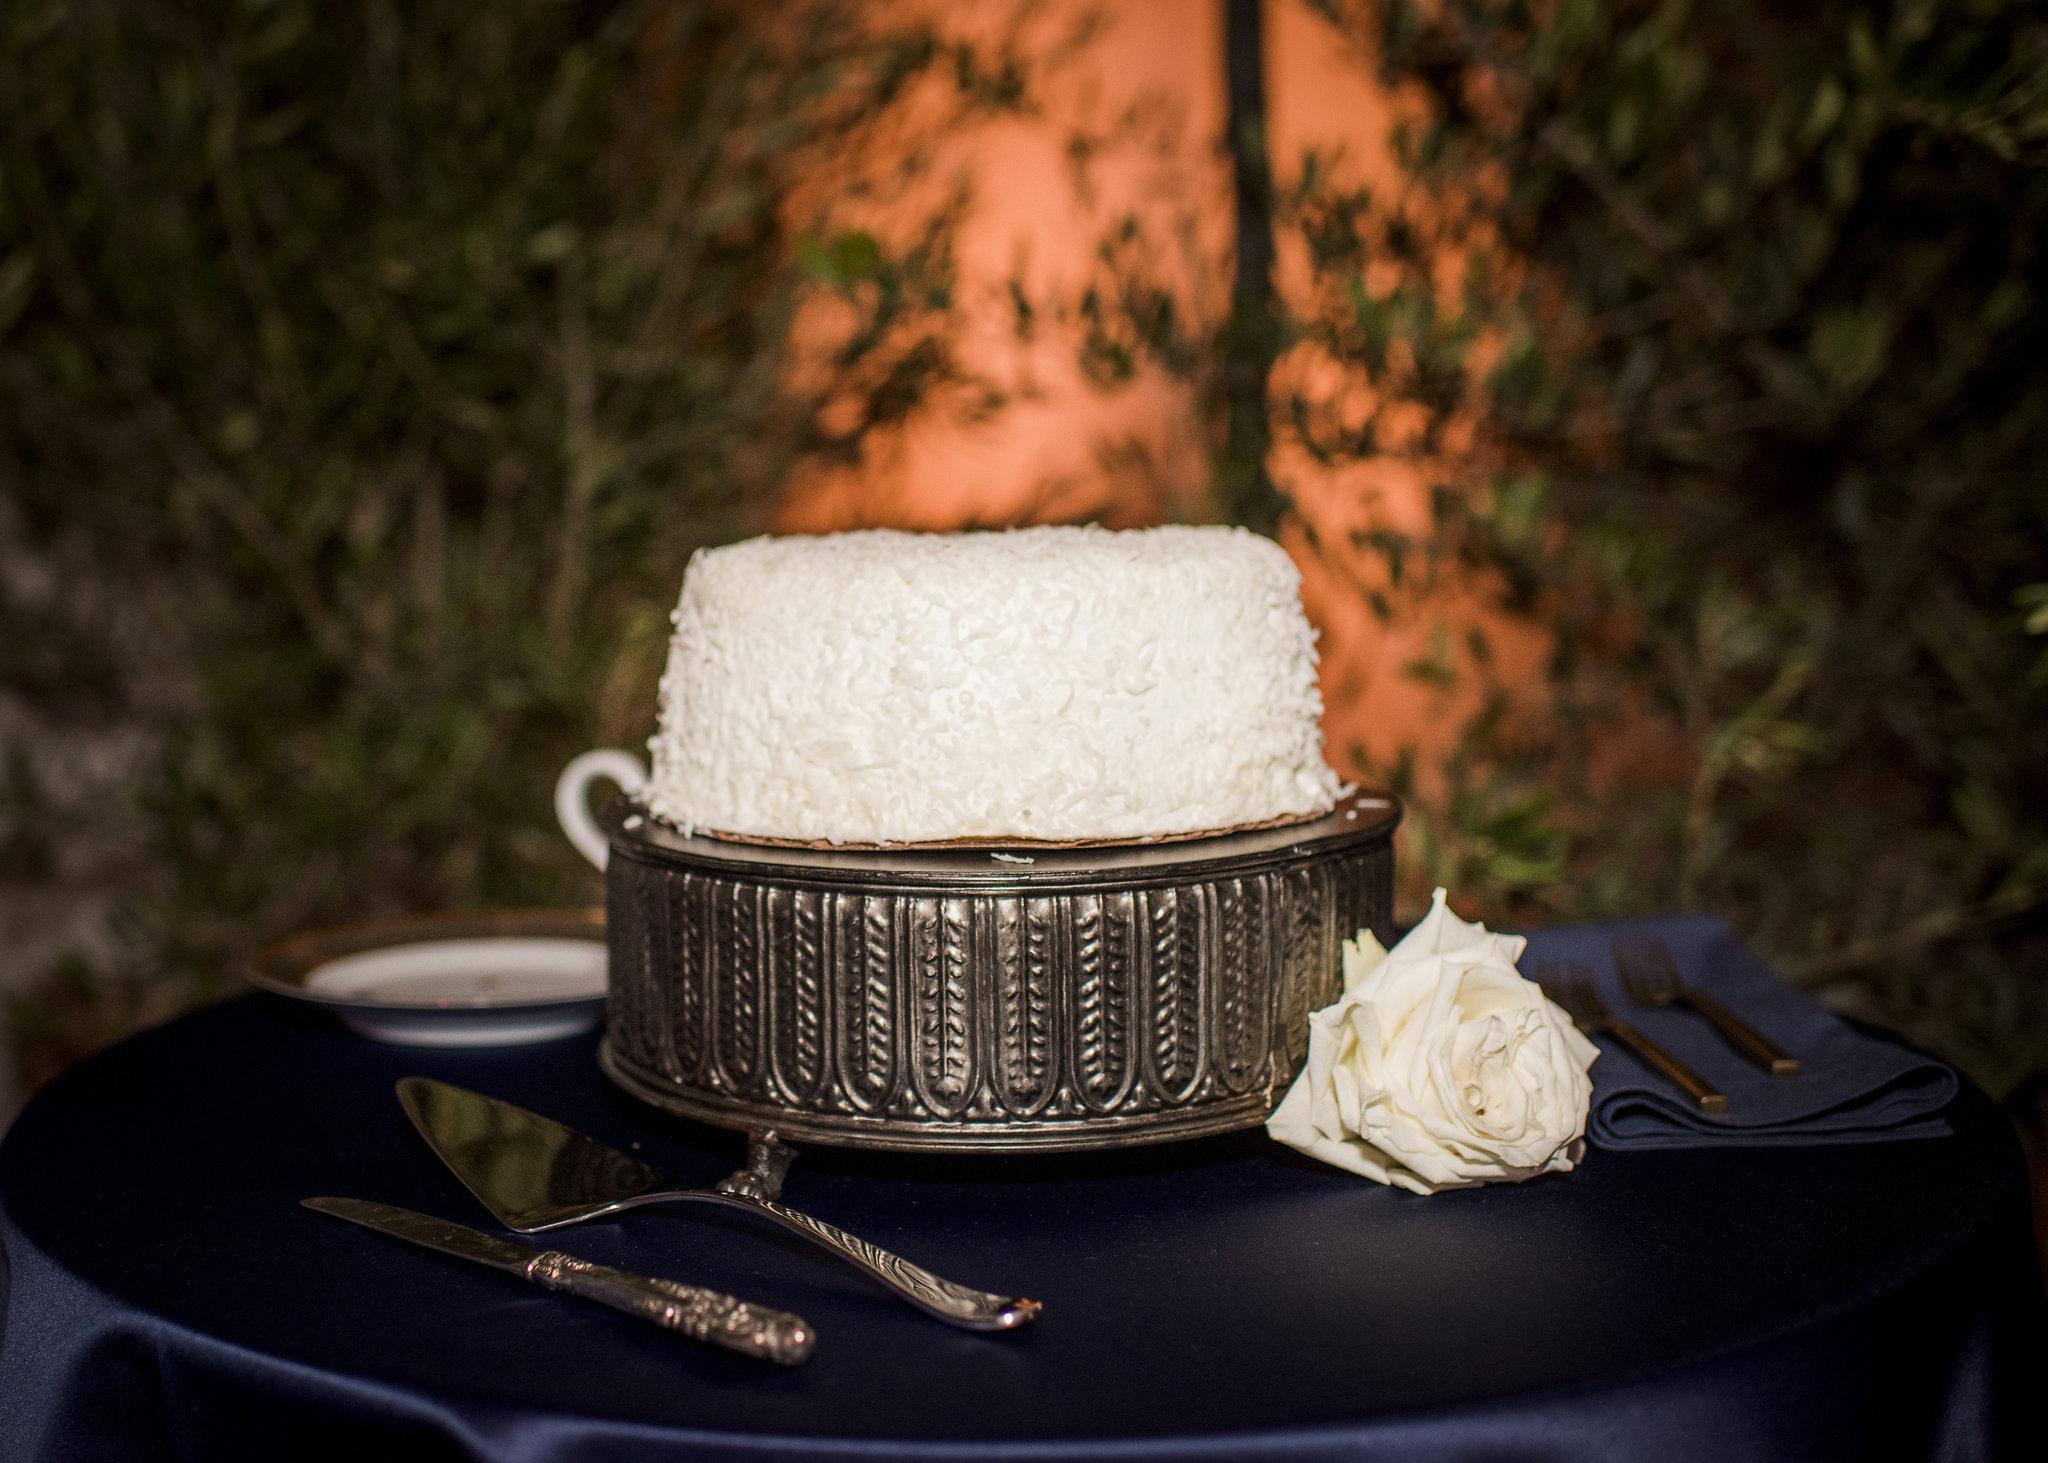 www.santabarbarawedding.com | Willa Kveta Photography | The Prop House Lounge and Warehouse | Wedding Cake